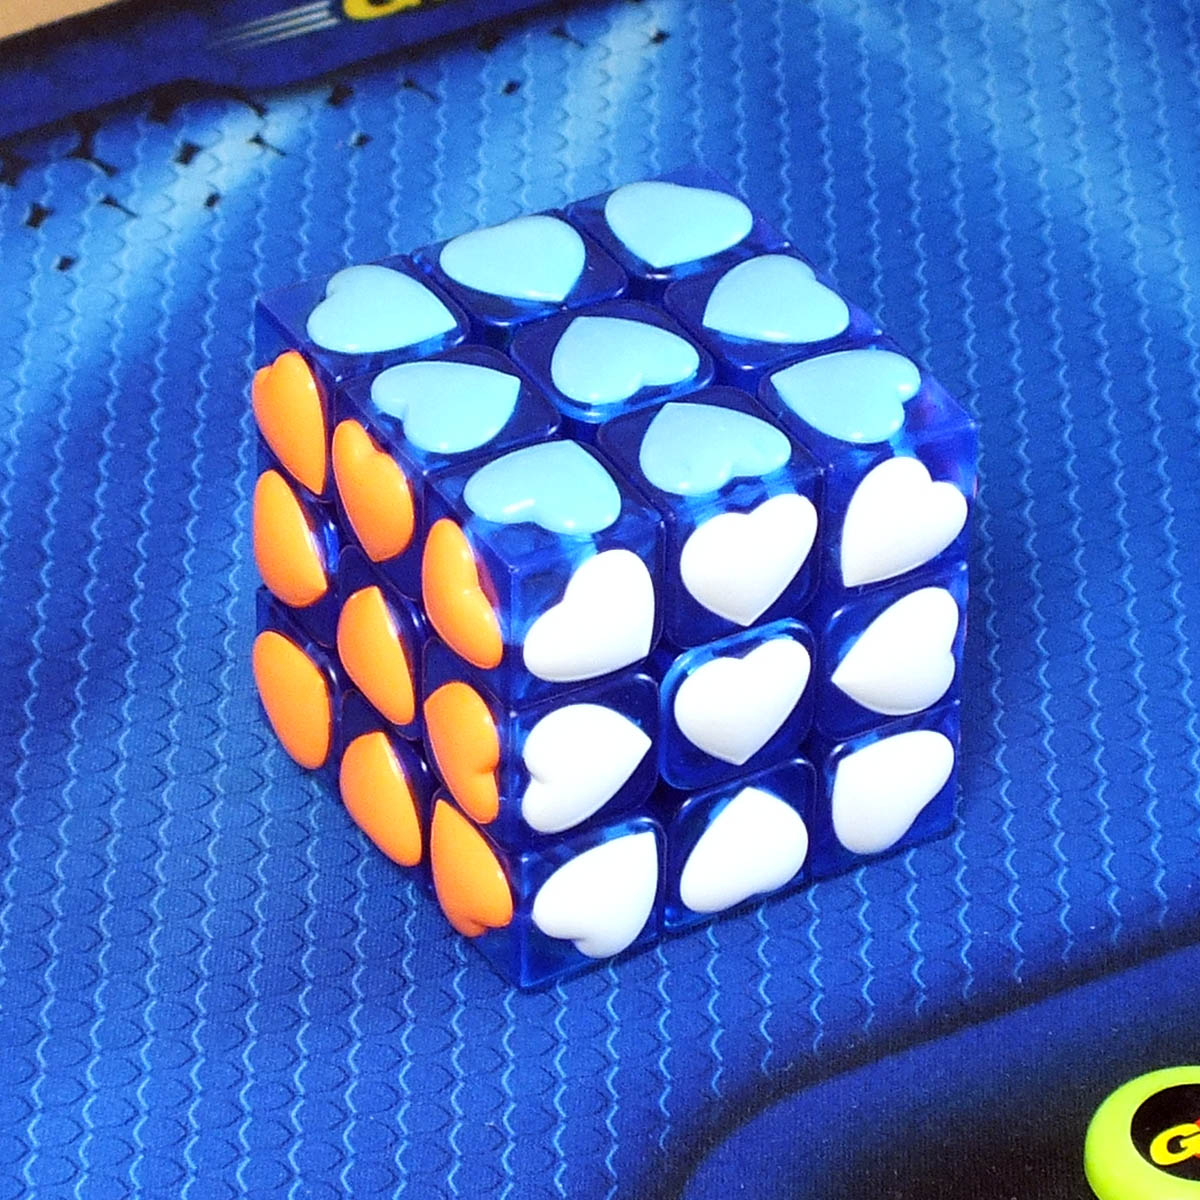 Moyu Love cube 3x3 transparent blue